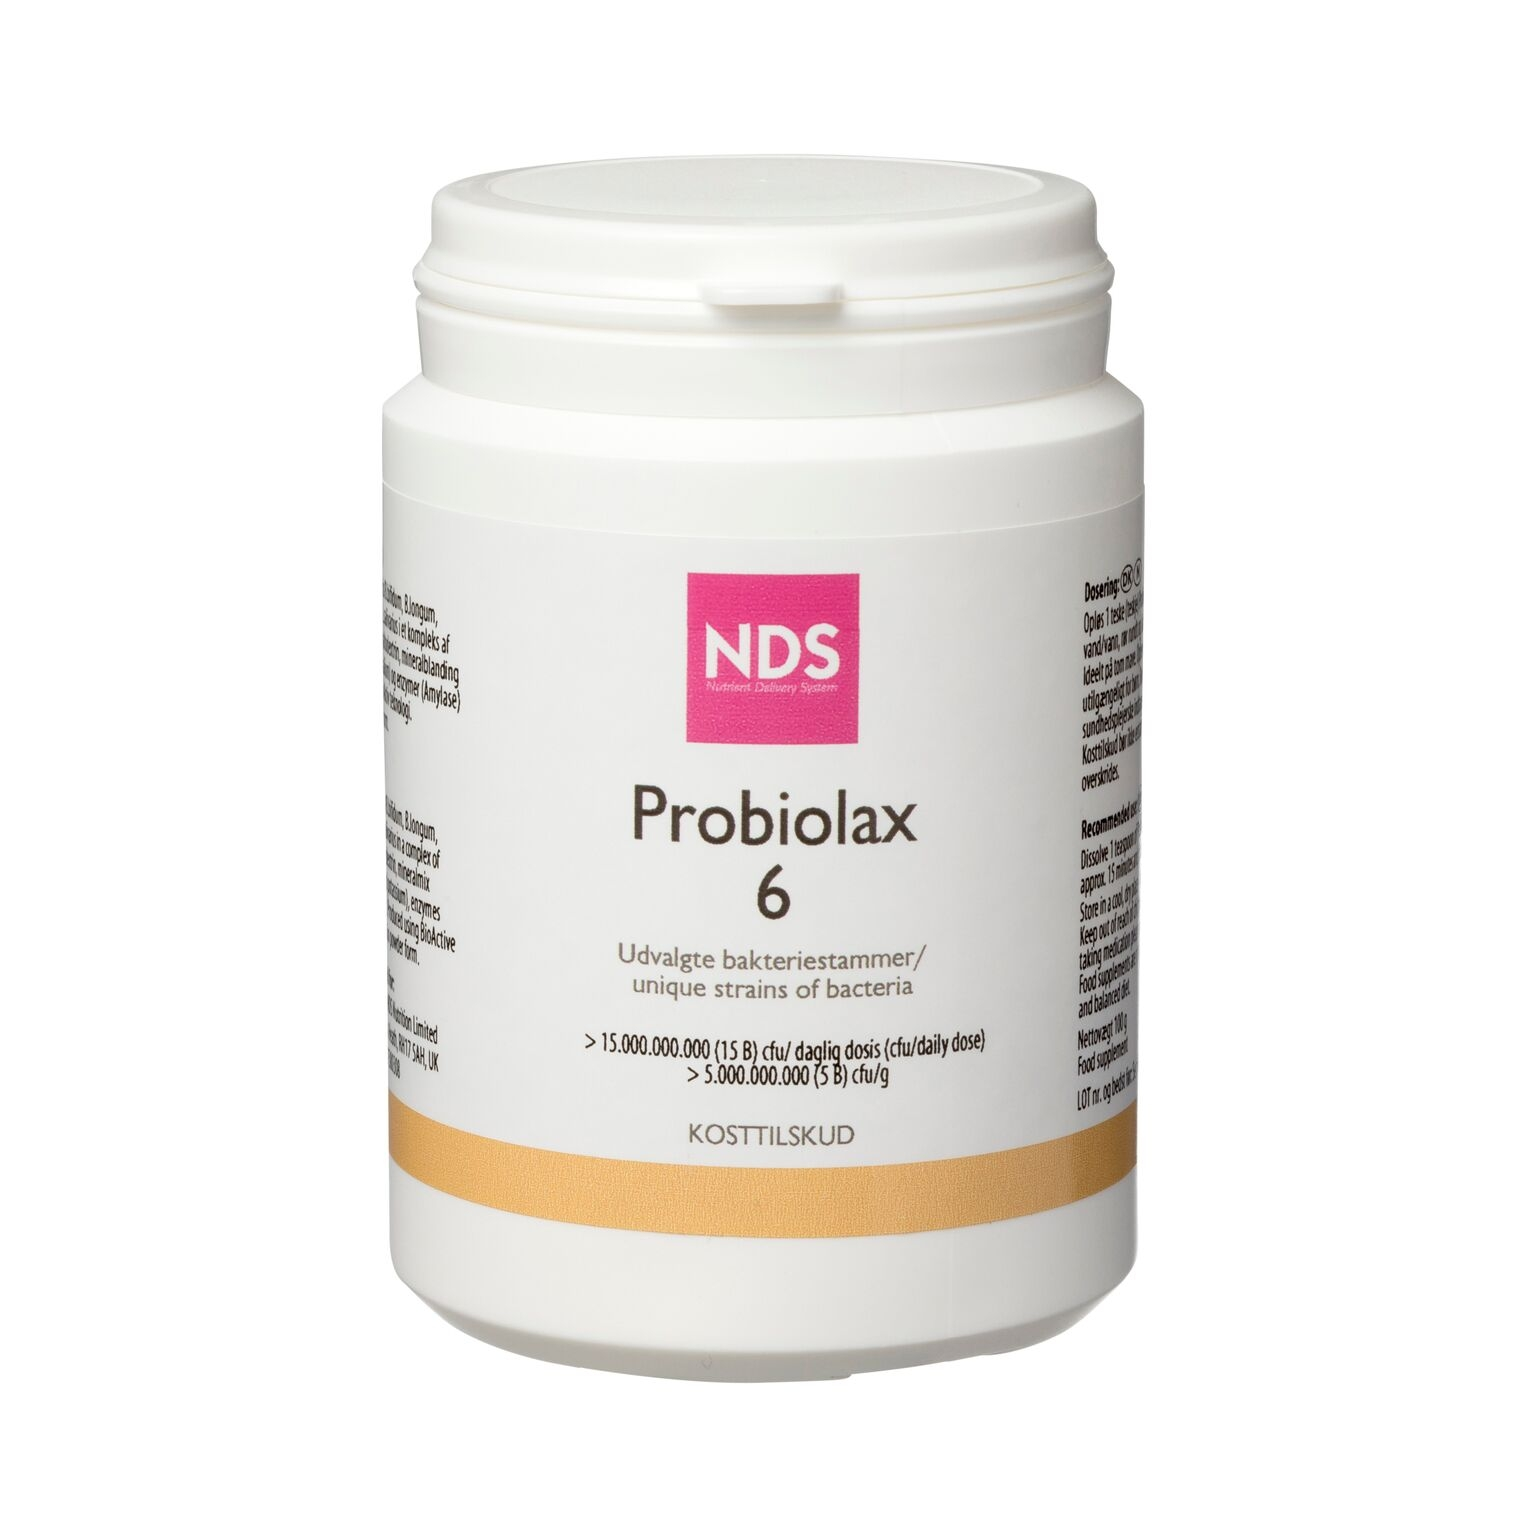 NDSProbiolax6 (100g)